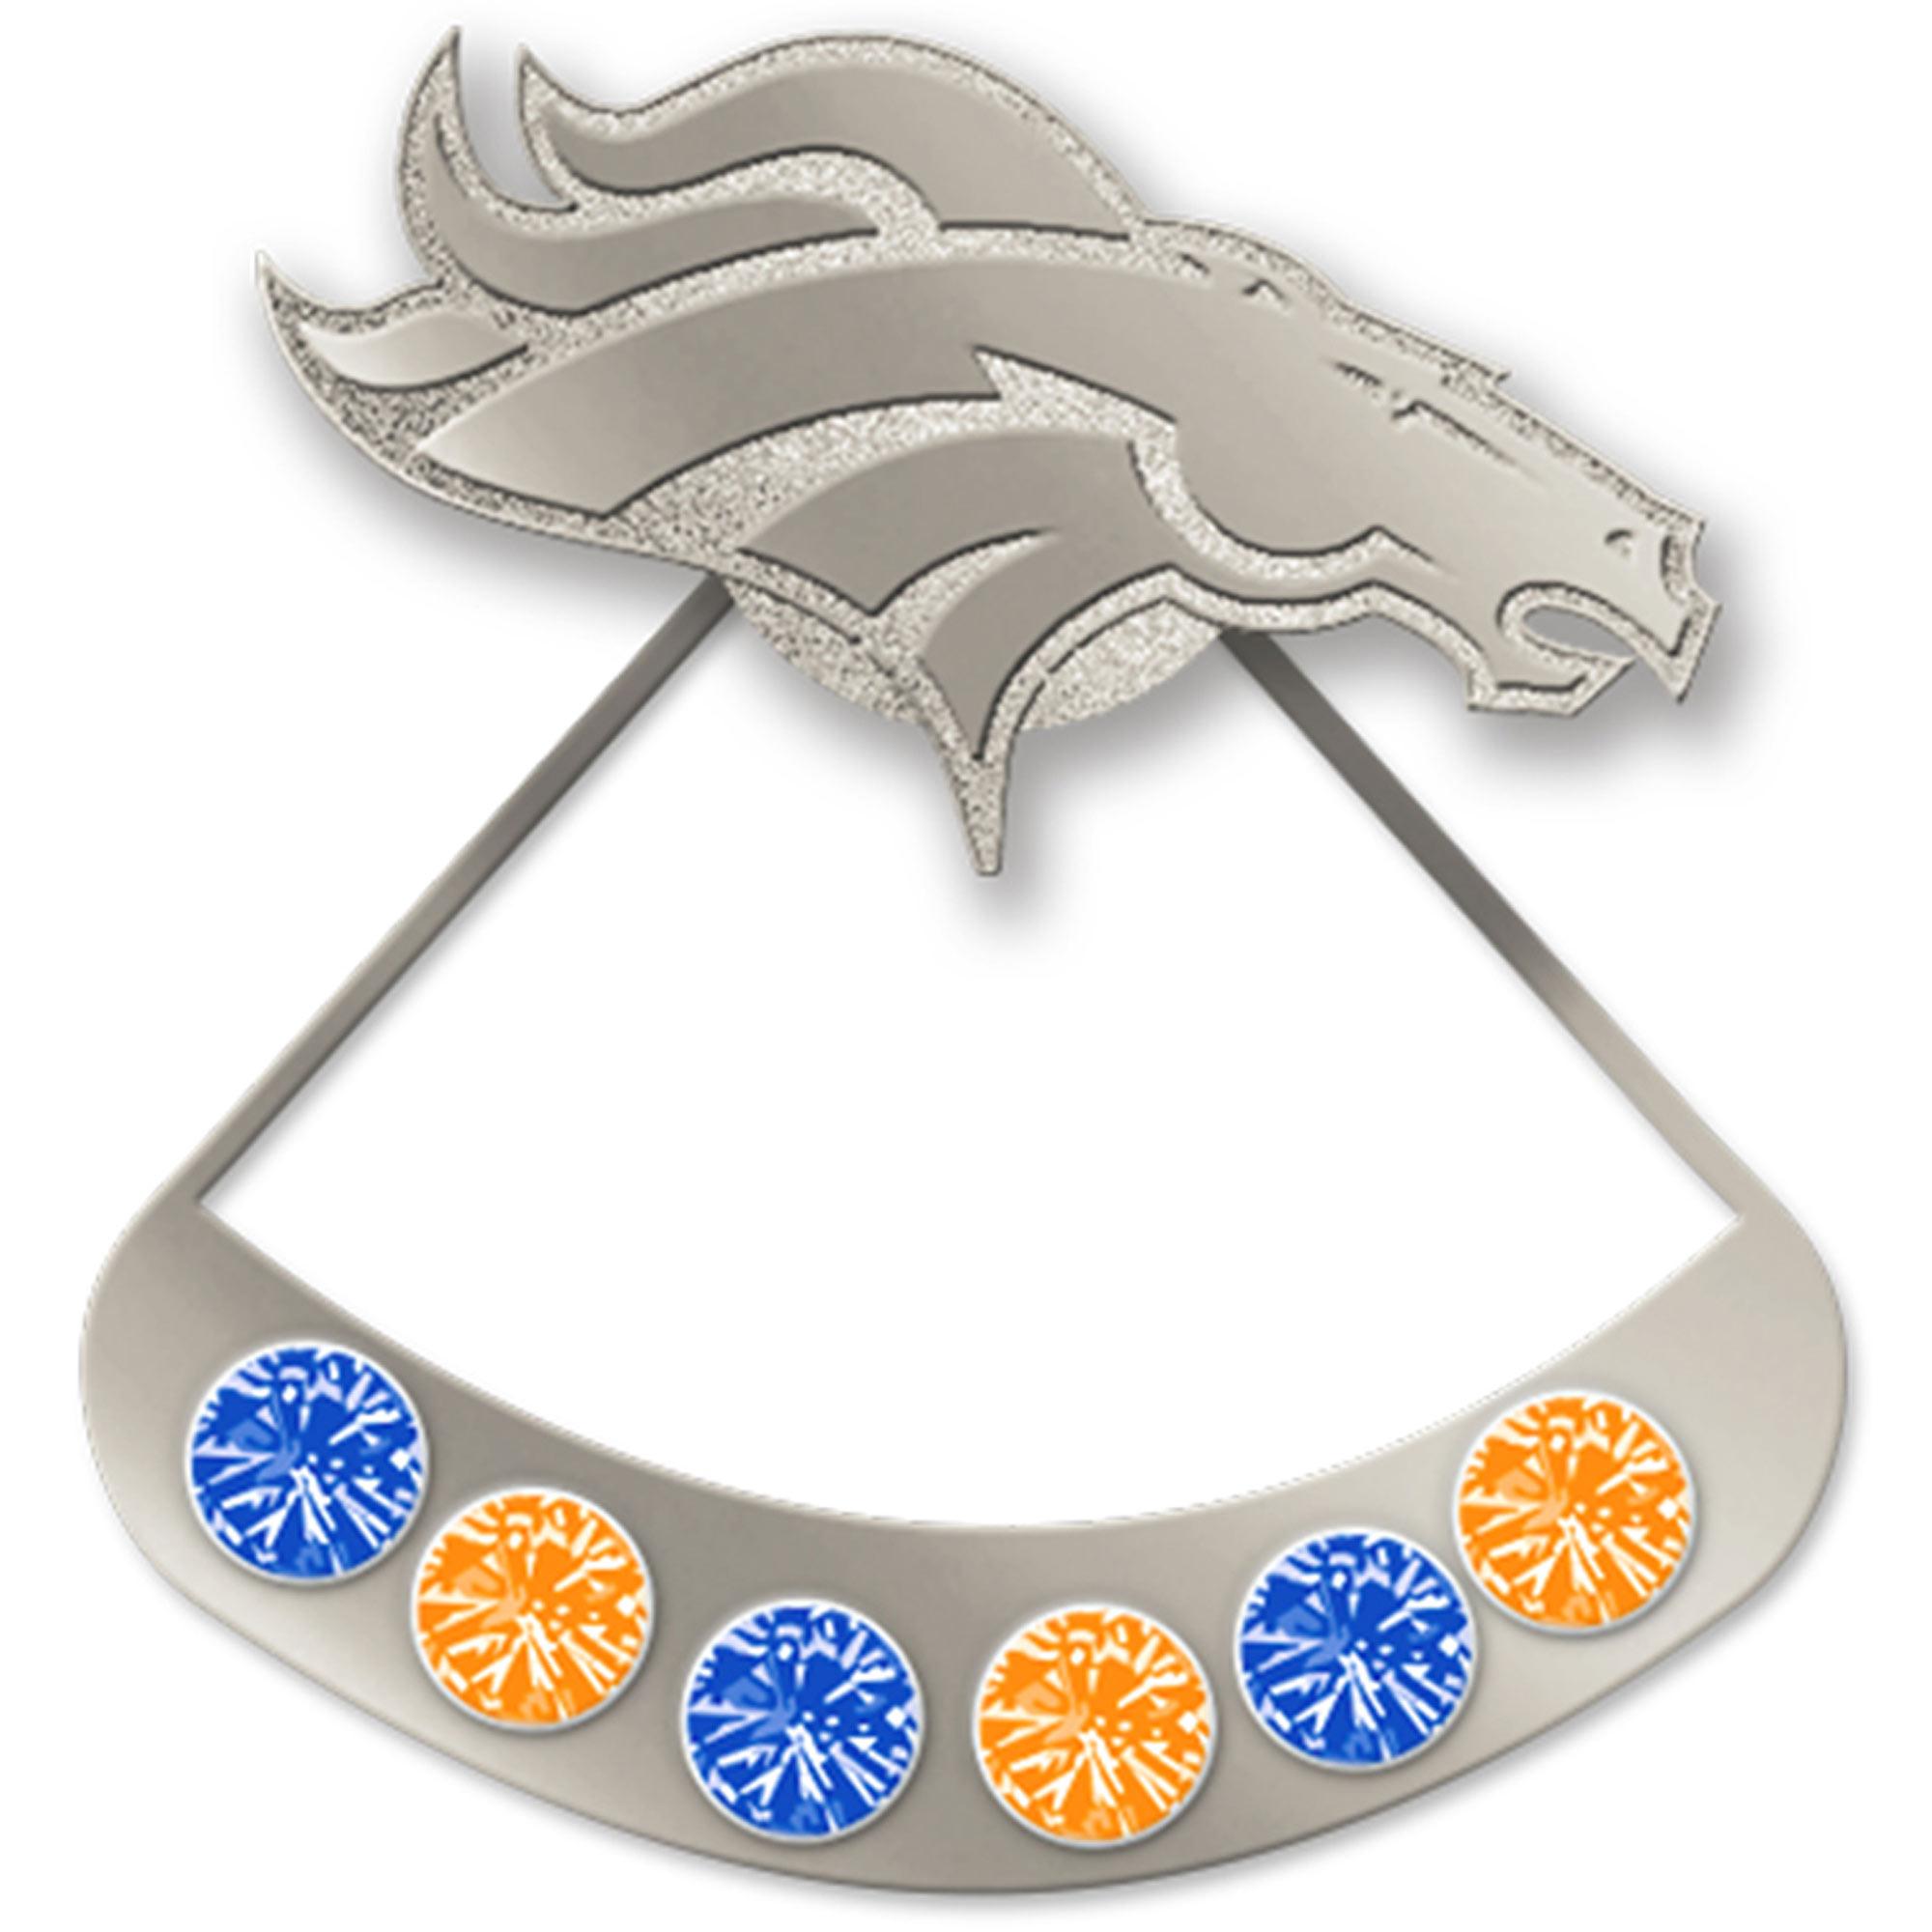 Denver Broncos WinCraft Hidden Gem Earrings - No Size